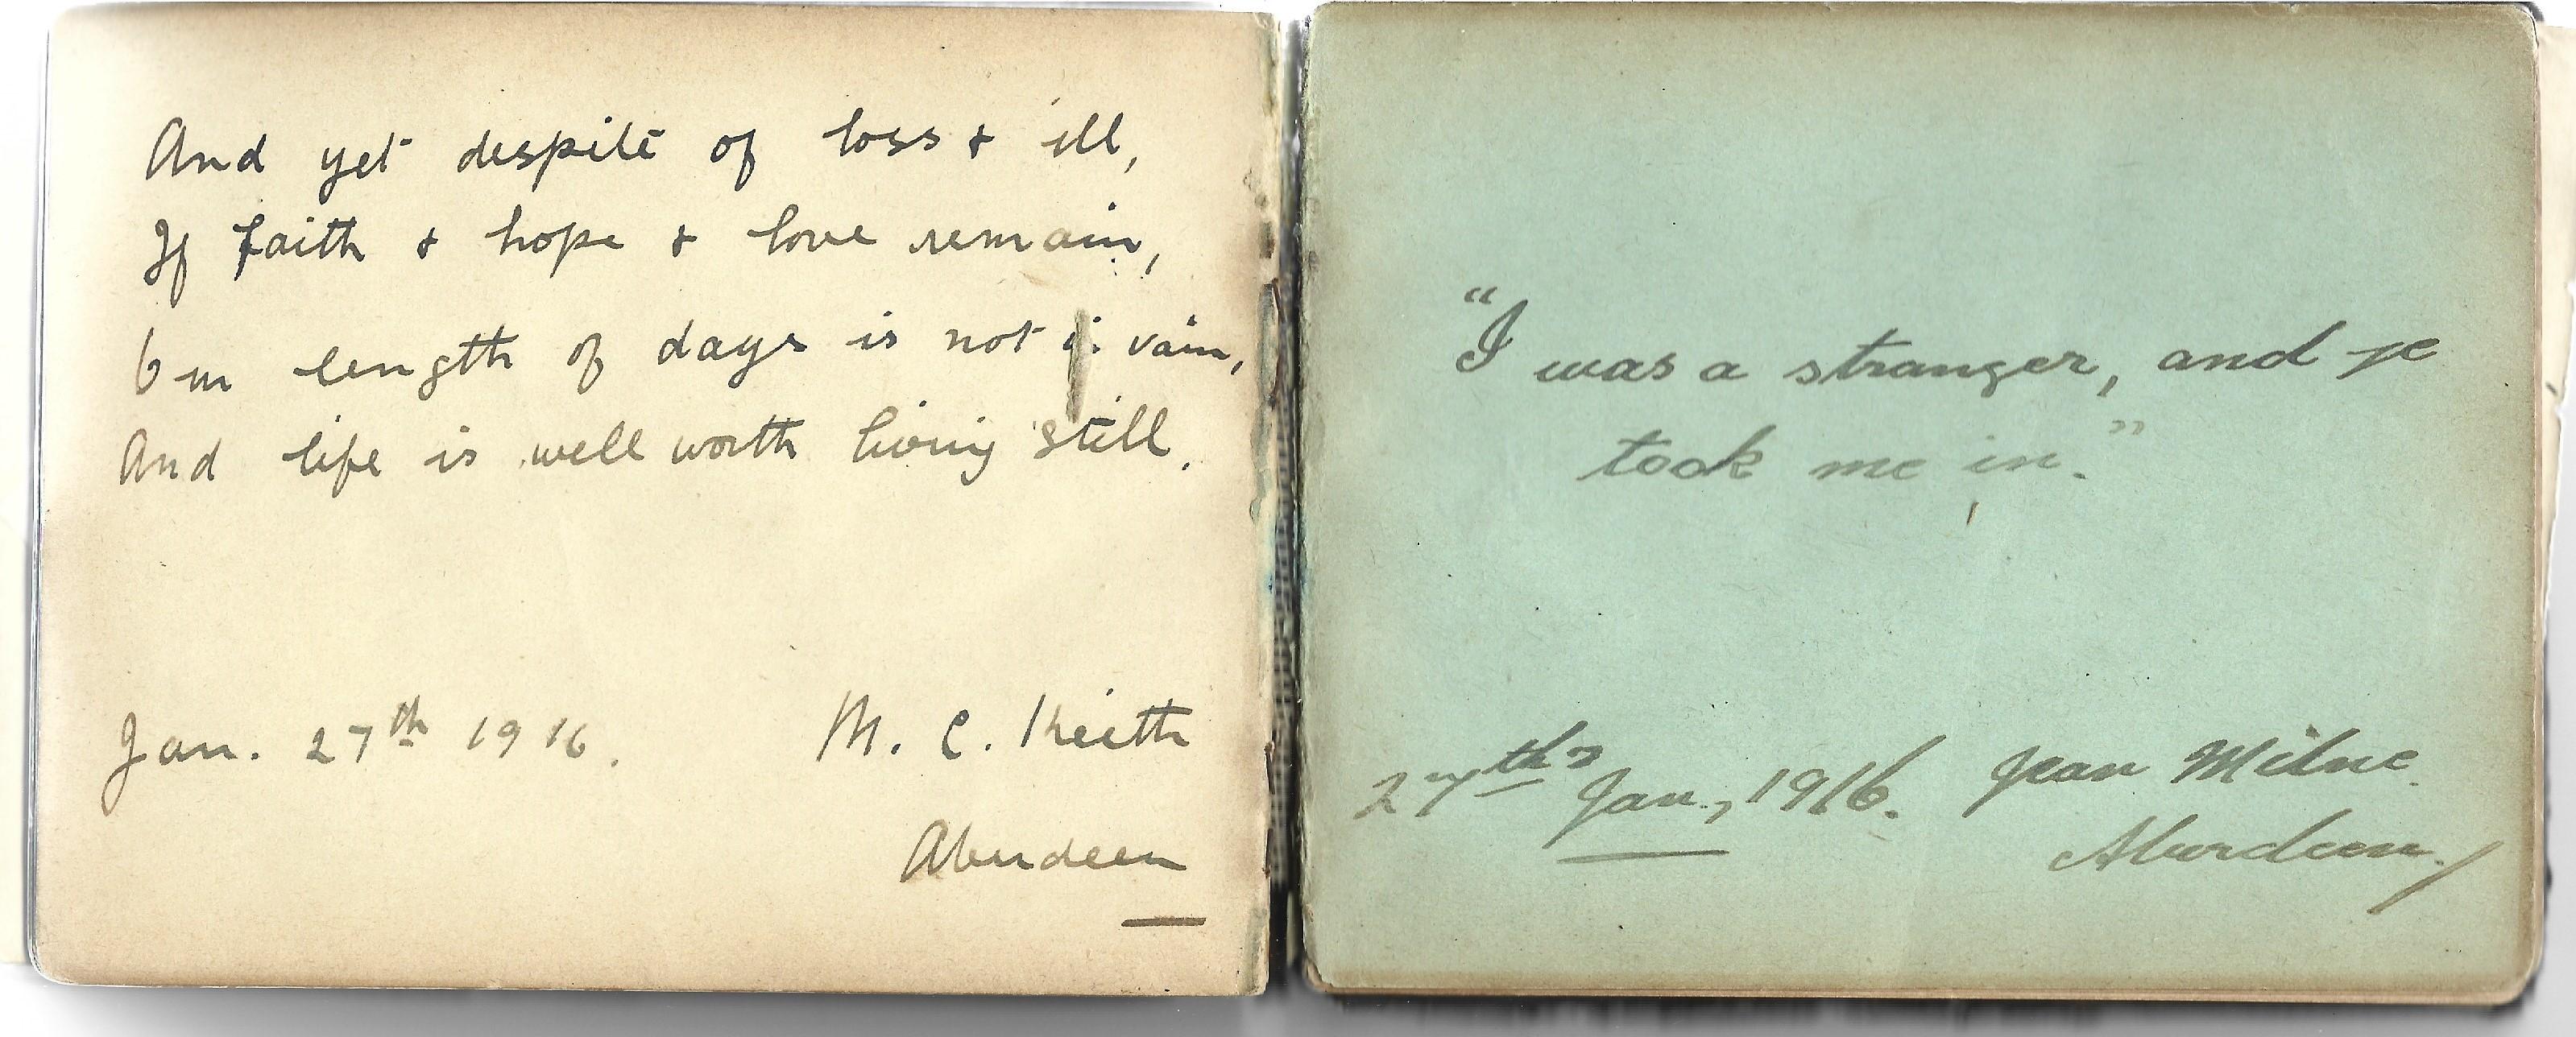 A World War 1 era autograph album, mostly comprising poignant poems and verses, a few original - Image 2 of 8